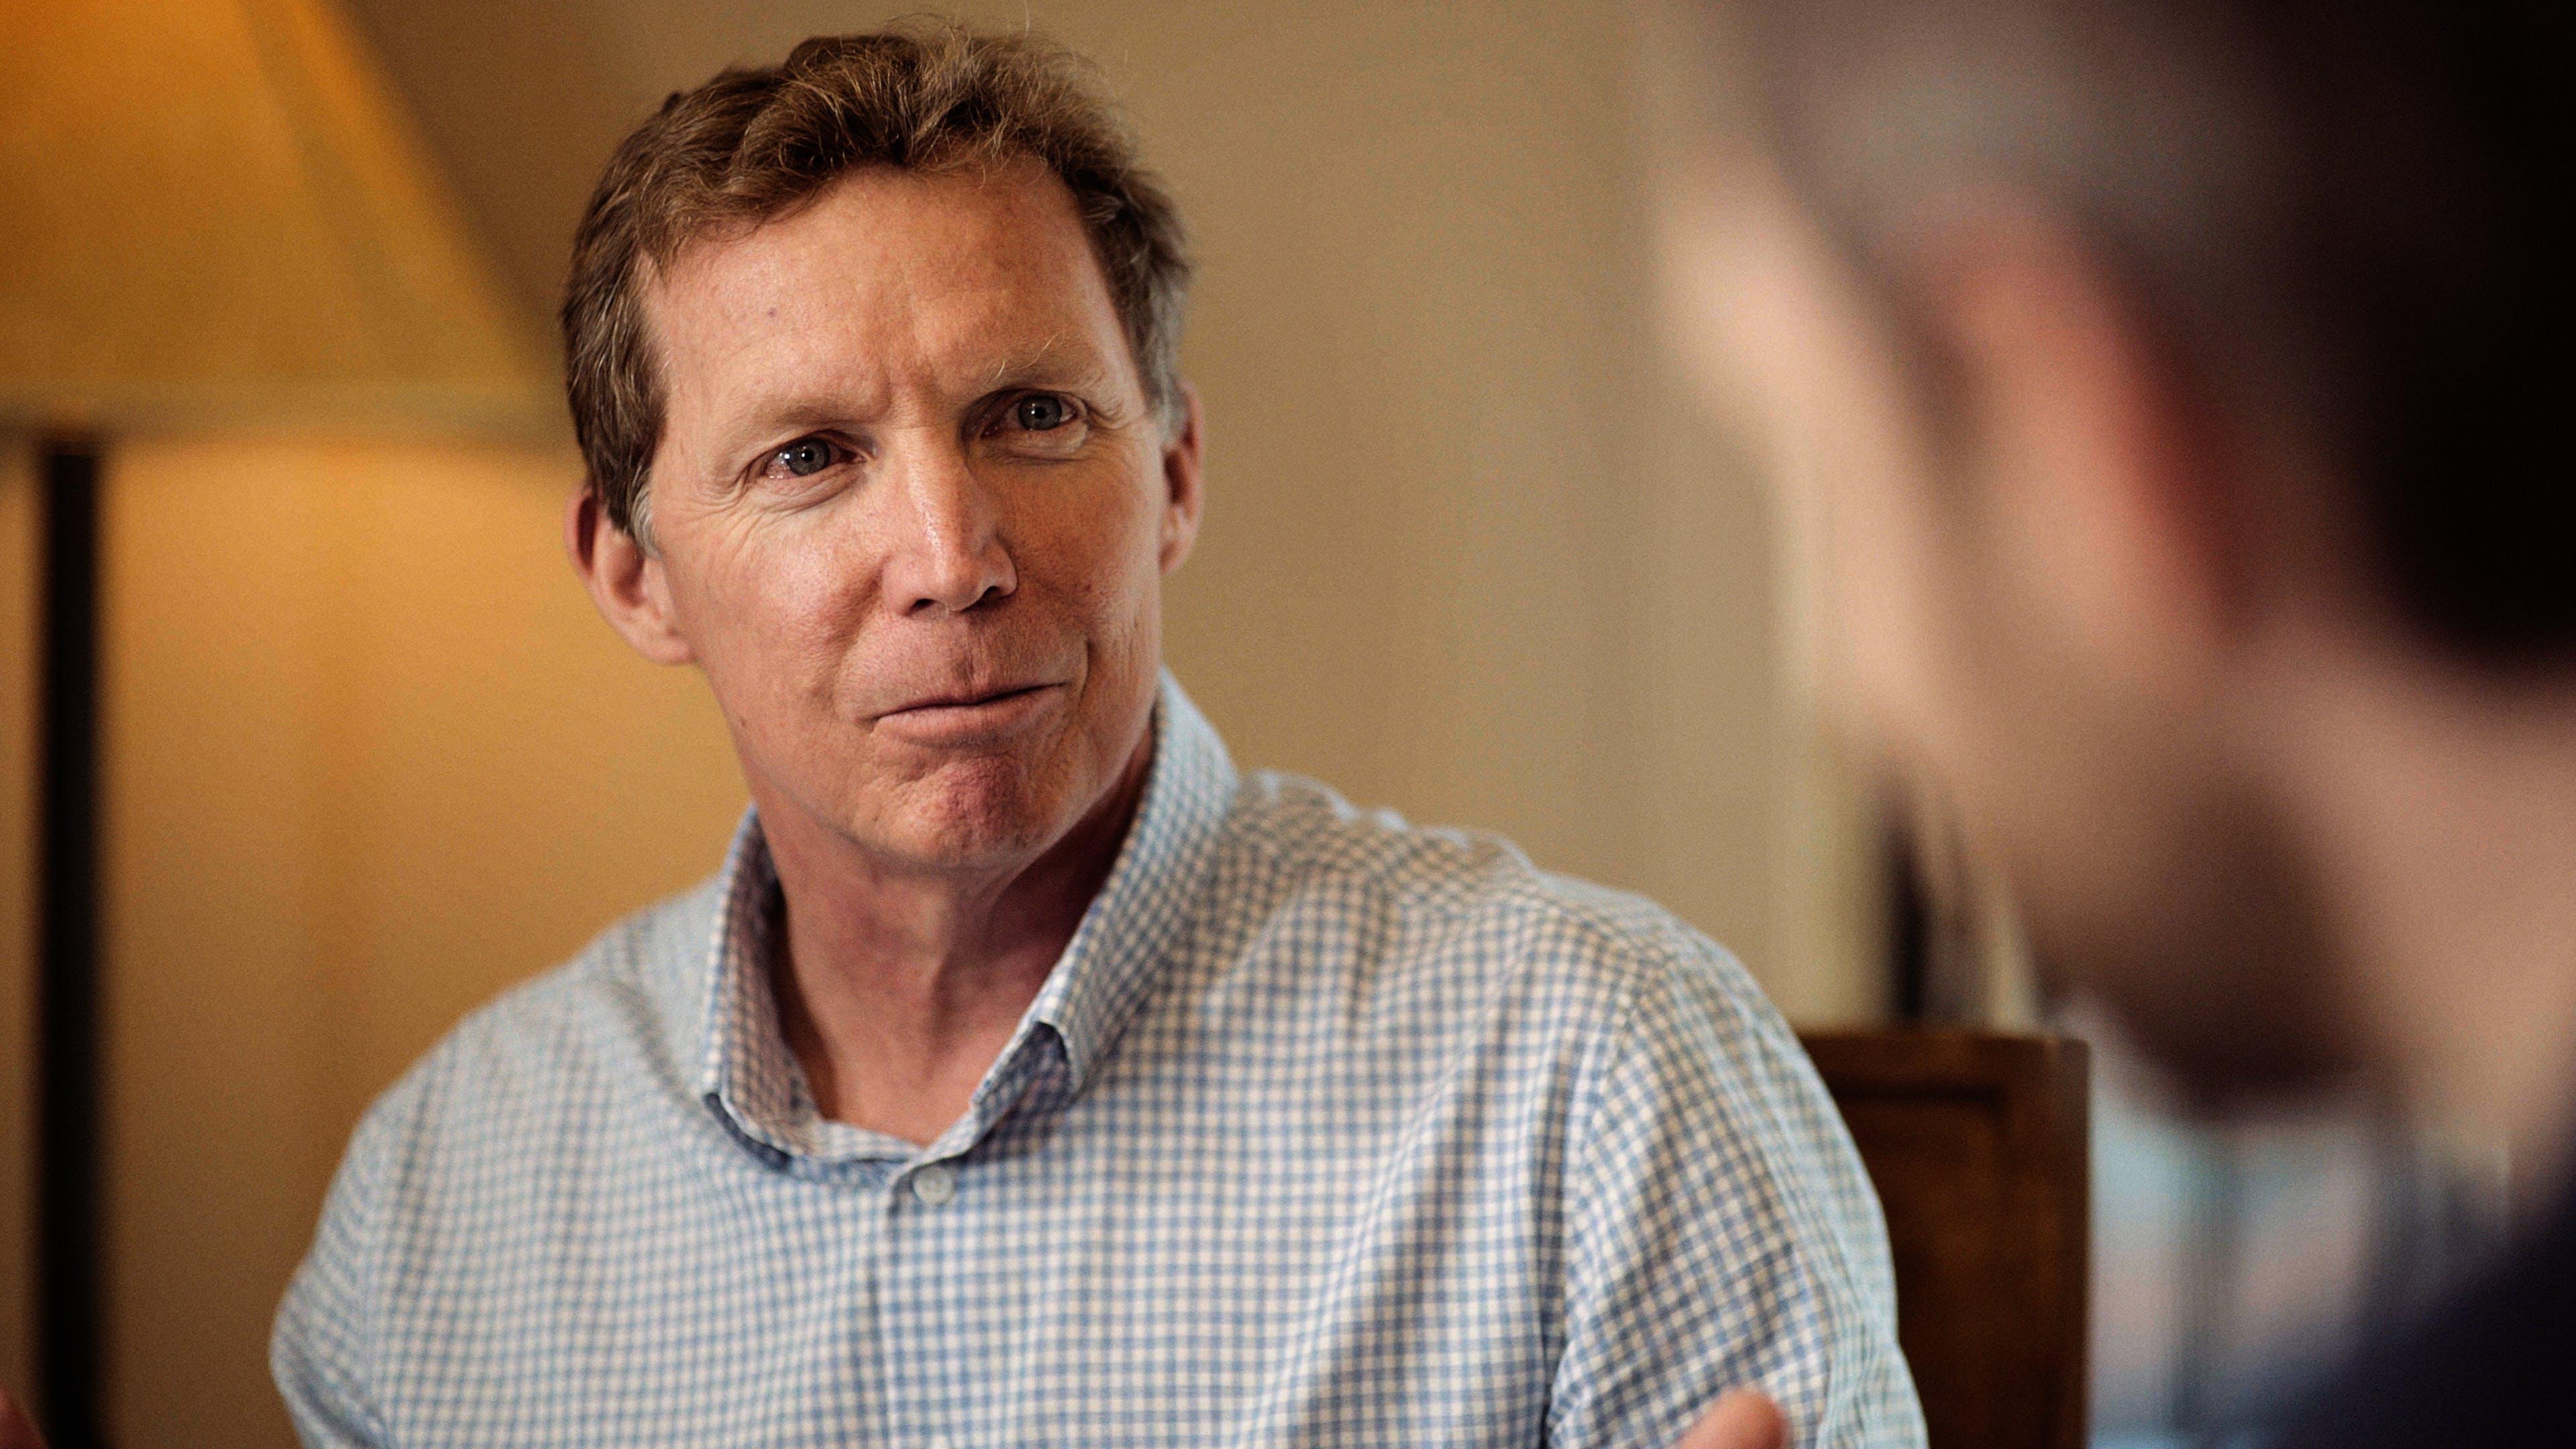 """Bullying, mobbing and victimization"": Gary Fettke says ""enough is enough"""